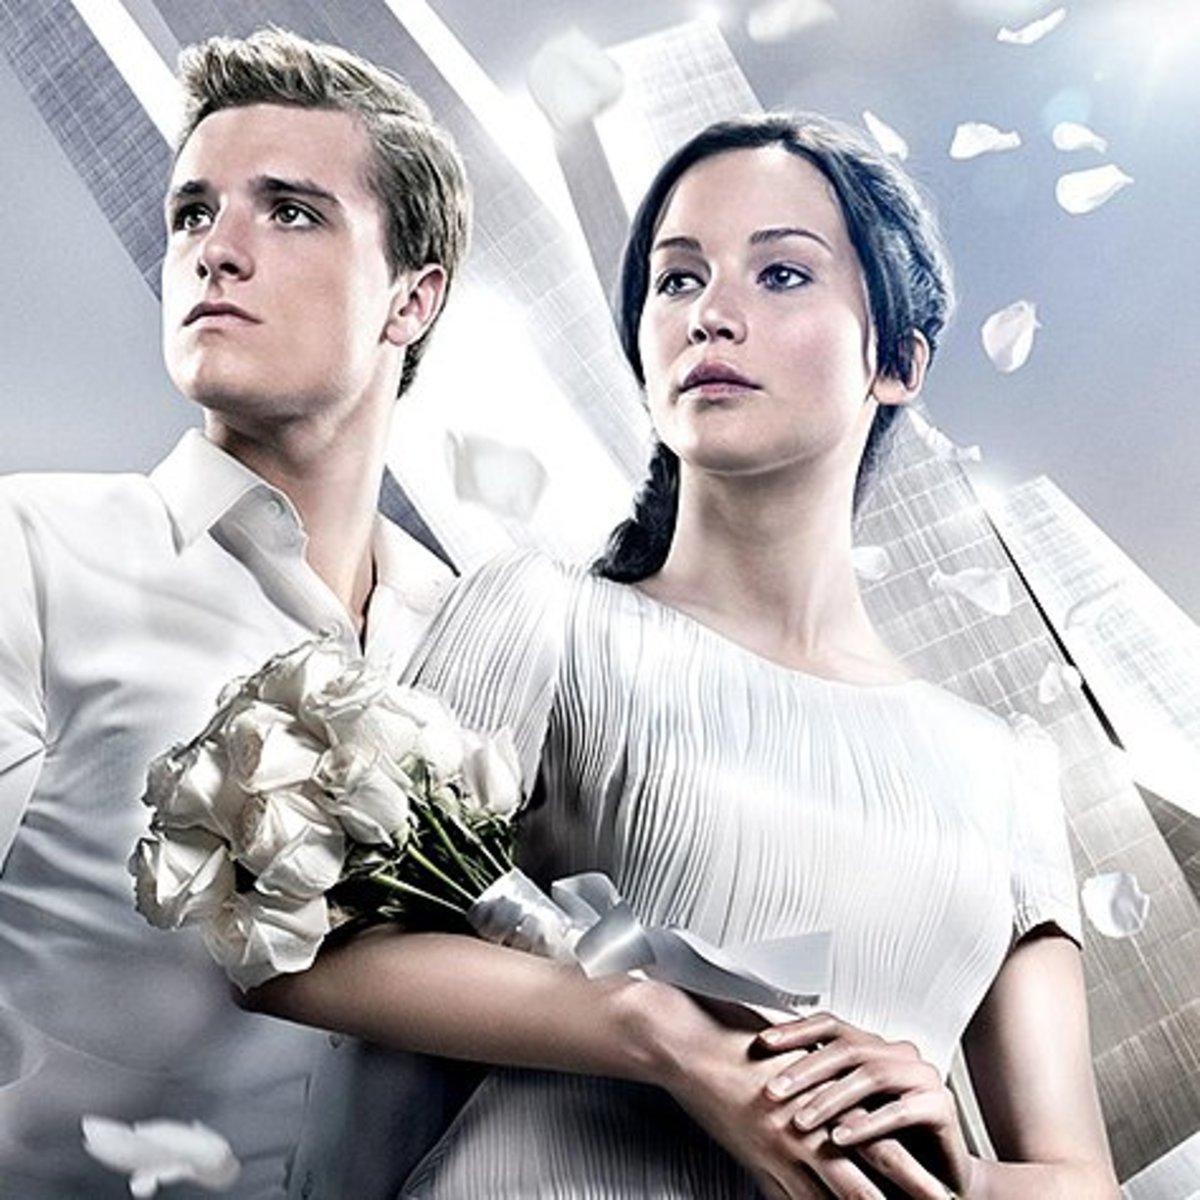 Image from: www.popsugar.com/entertainment/Catching-Fire-Victory-Poster-Katniss-Peeta-28264113